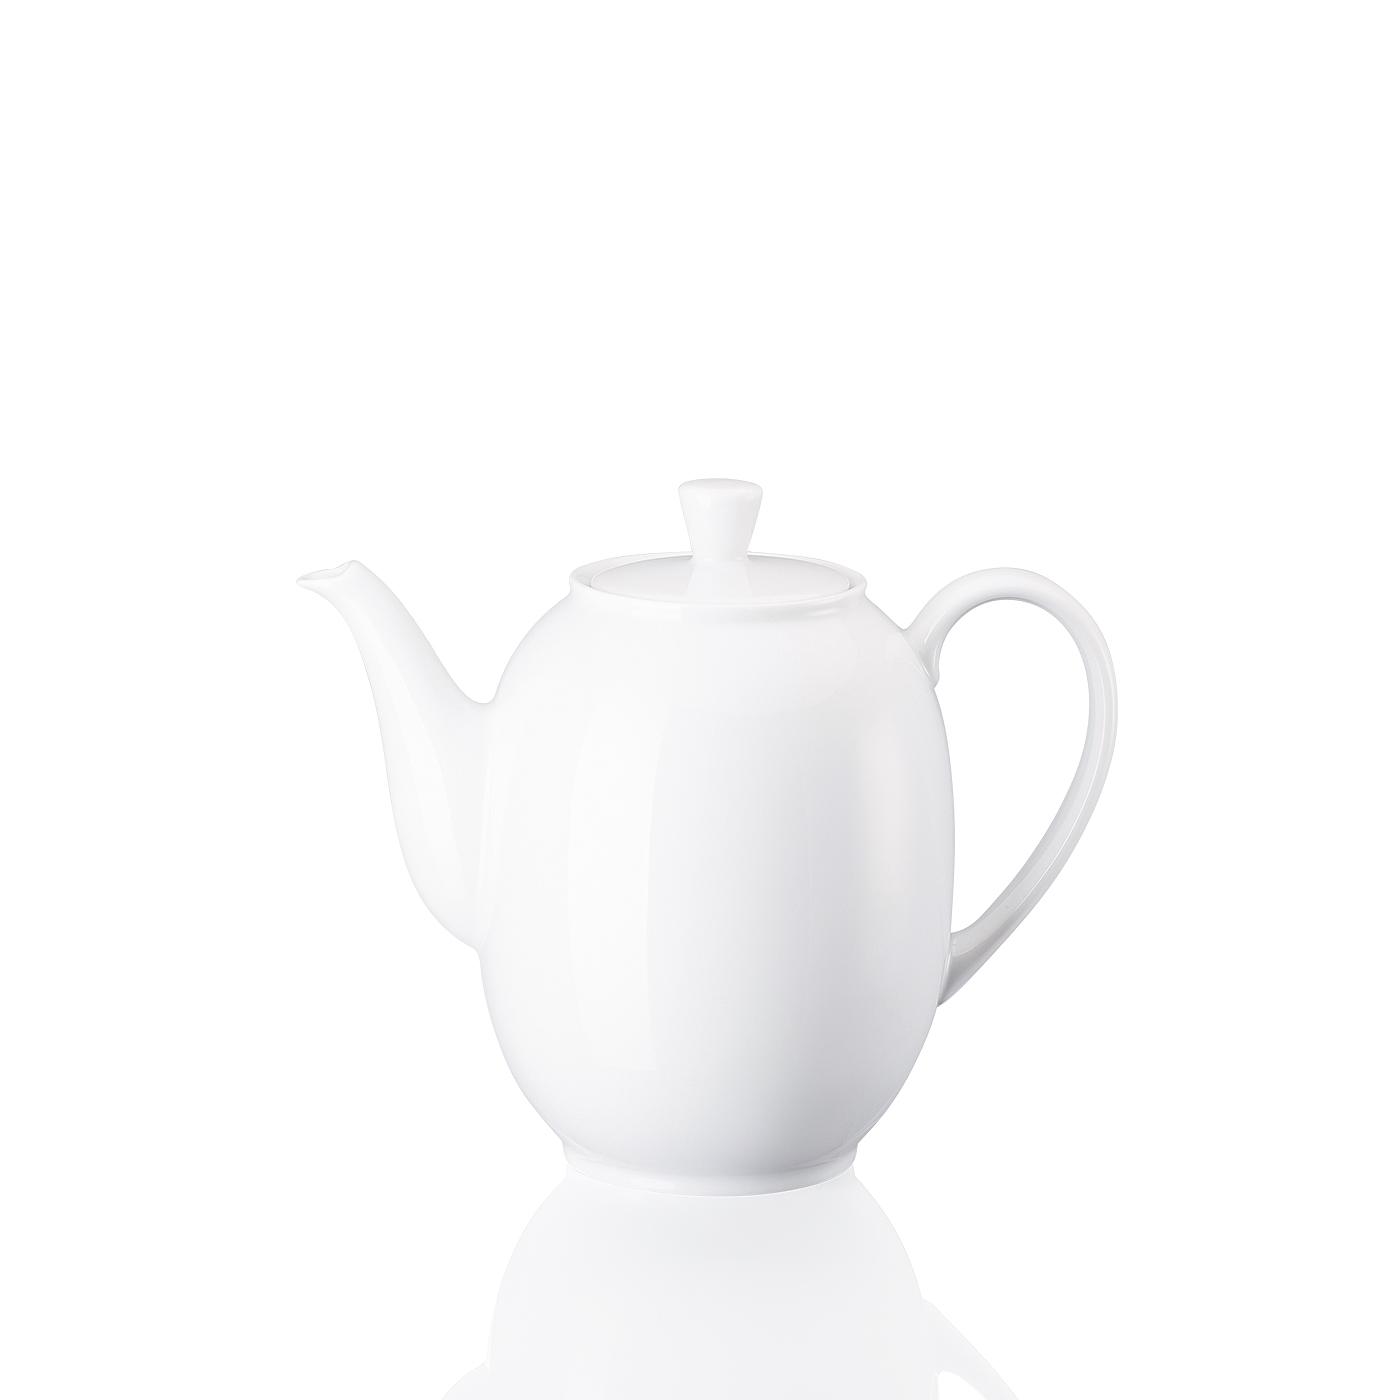 Kaffeekanne 6 P. Form 1382 Weiss Arzberg